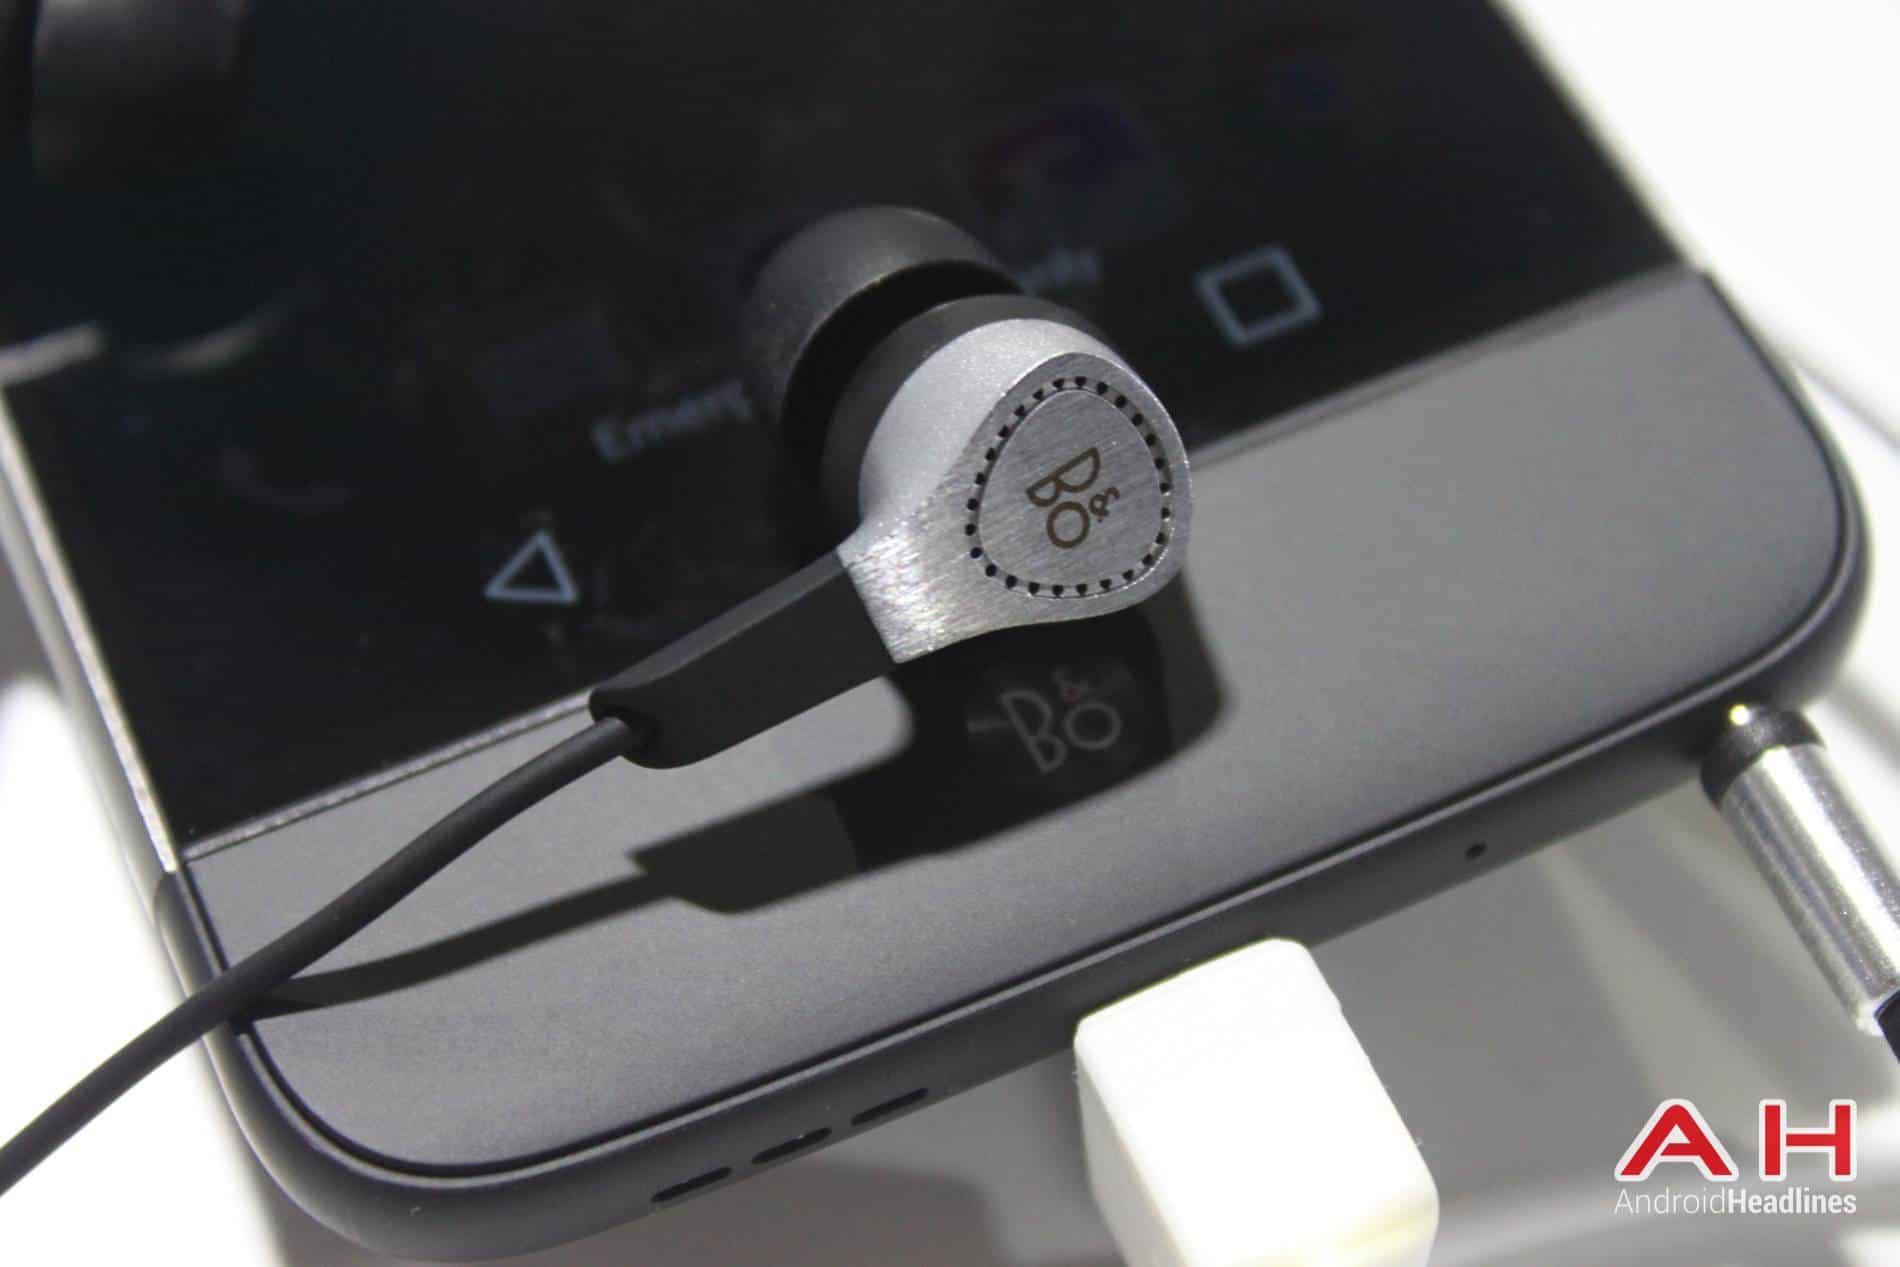 LG G5 B&O HiFi Plus AH 10